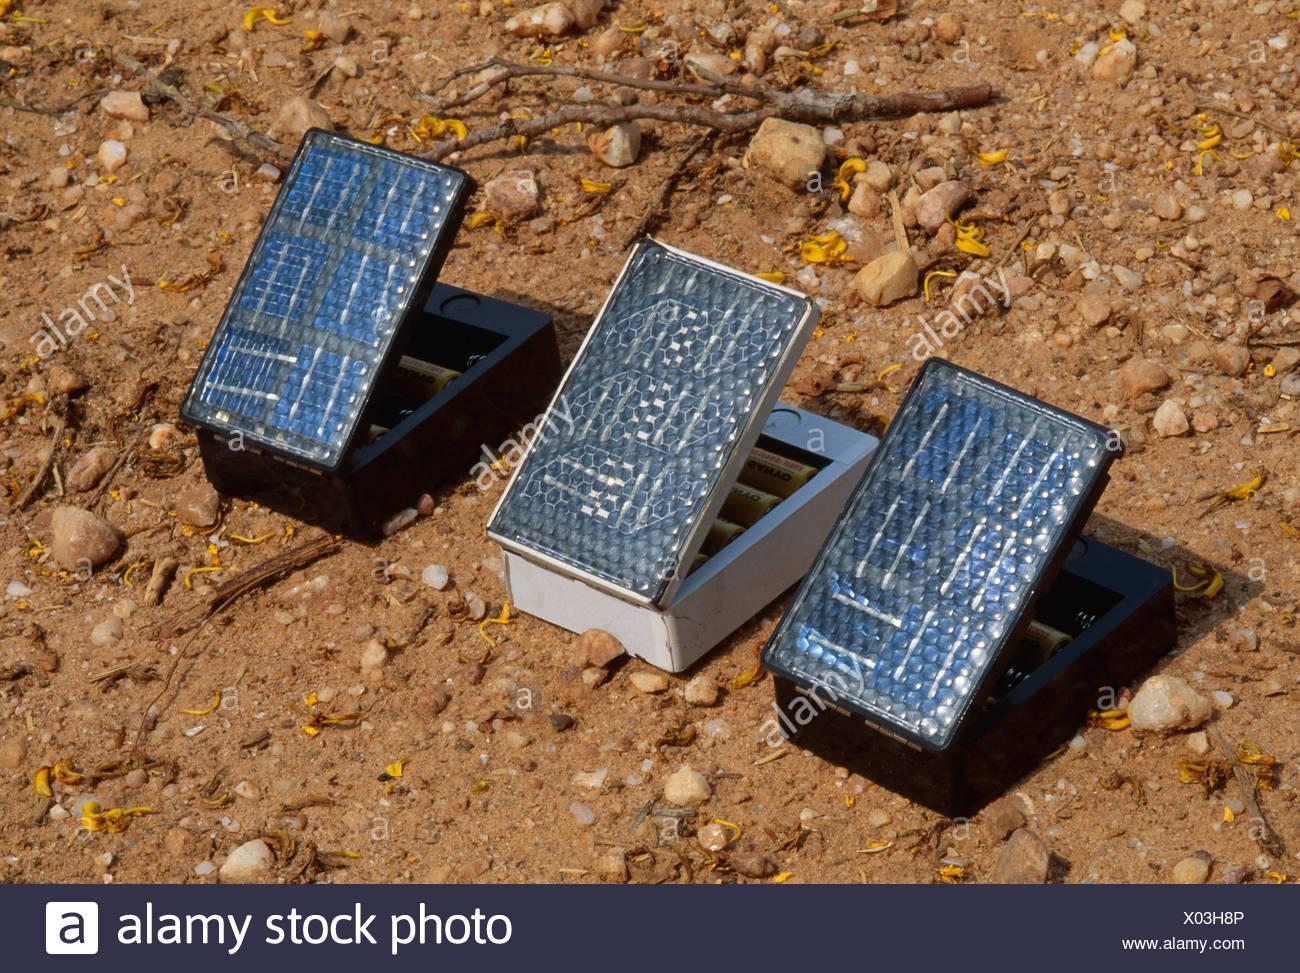 Uso DE PANELES SOLARES TÉRMICOS Imagen De Stock